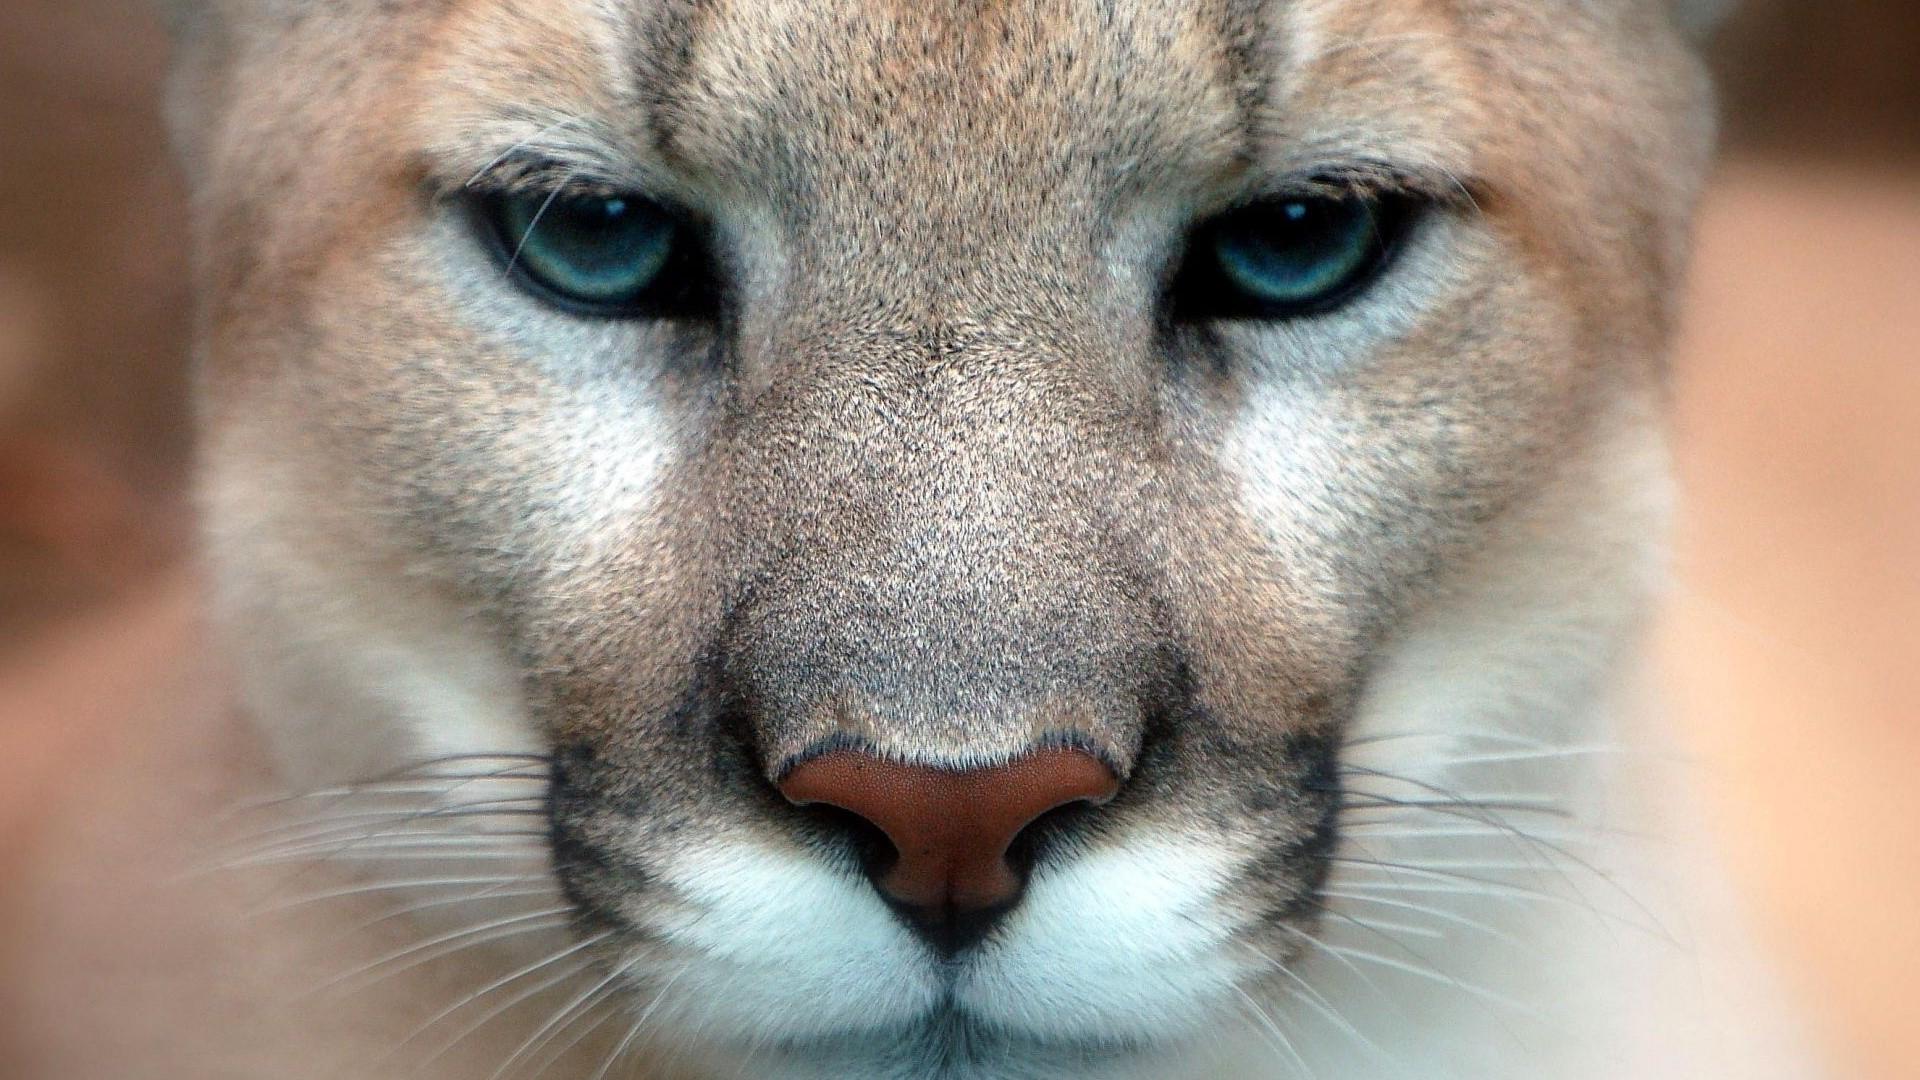 animals, Feline, Nature, Pumas Wallpaper HD